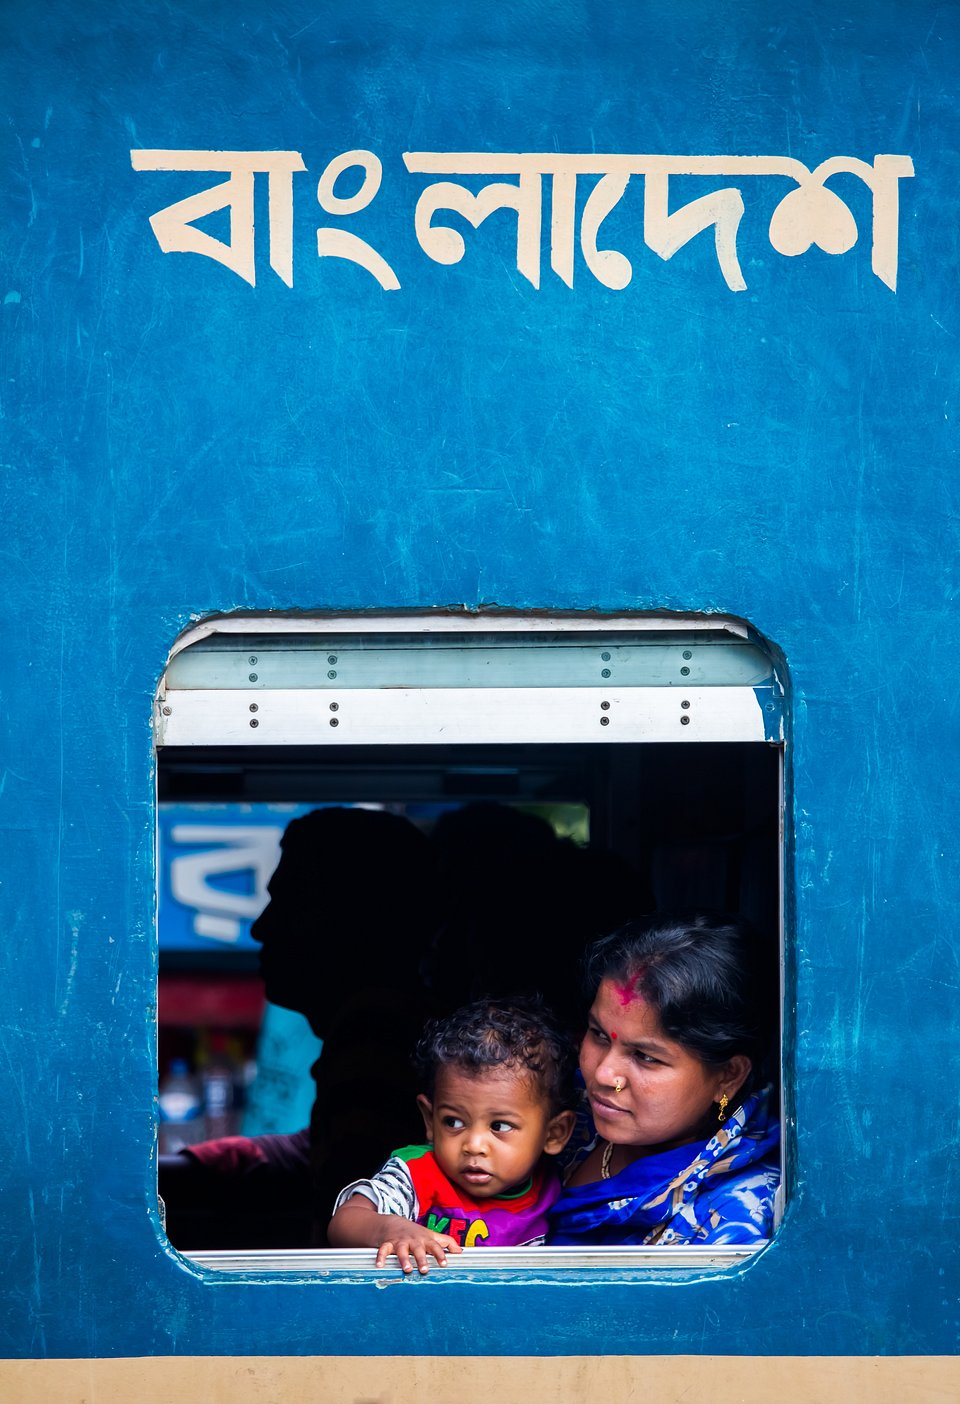 Location: Brahmanbaria, Bangladesh